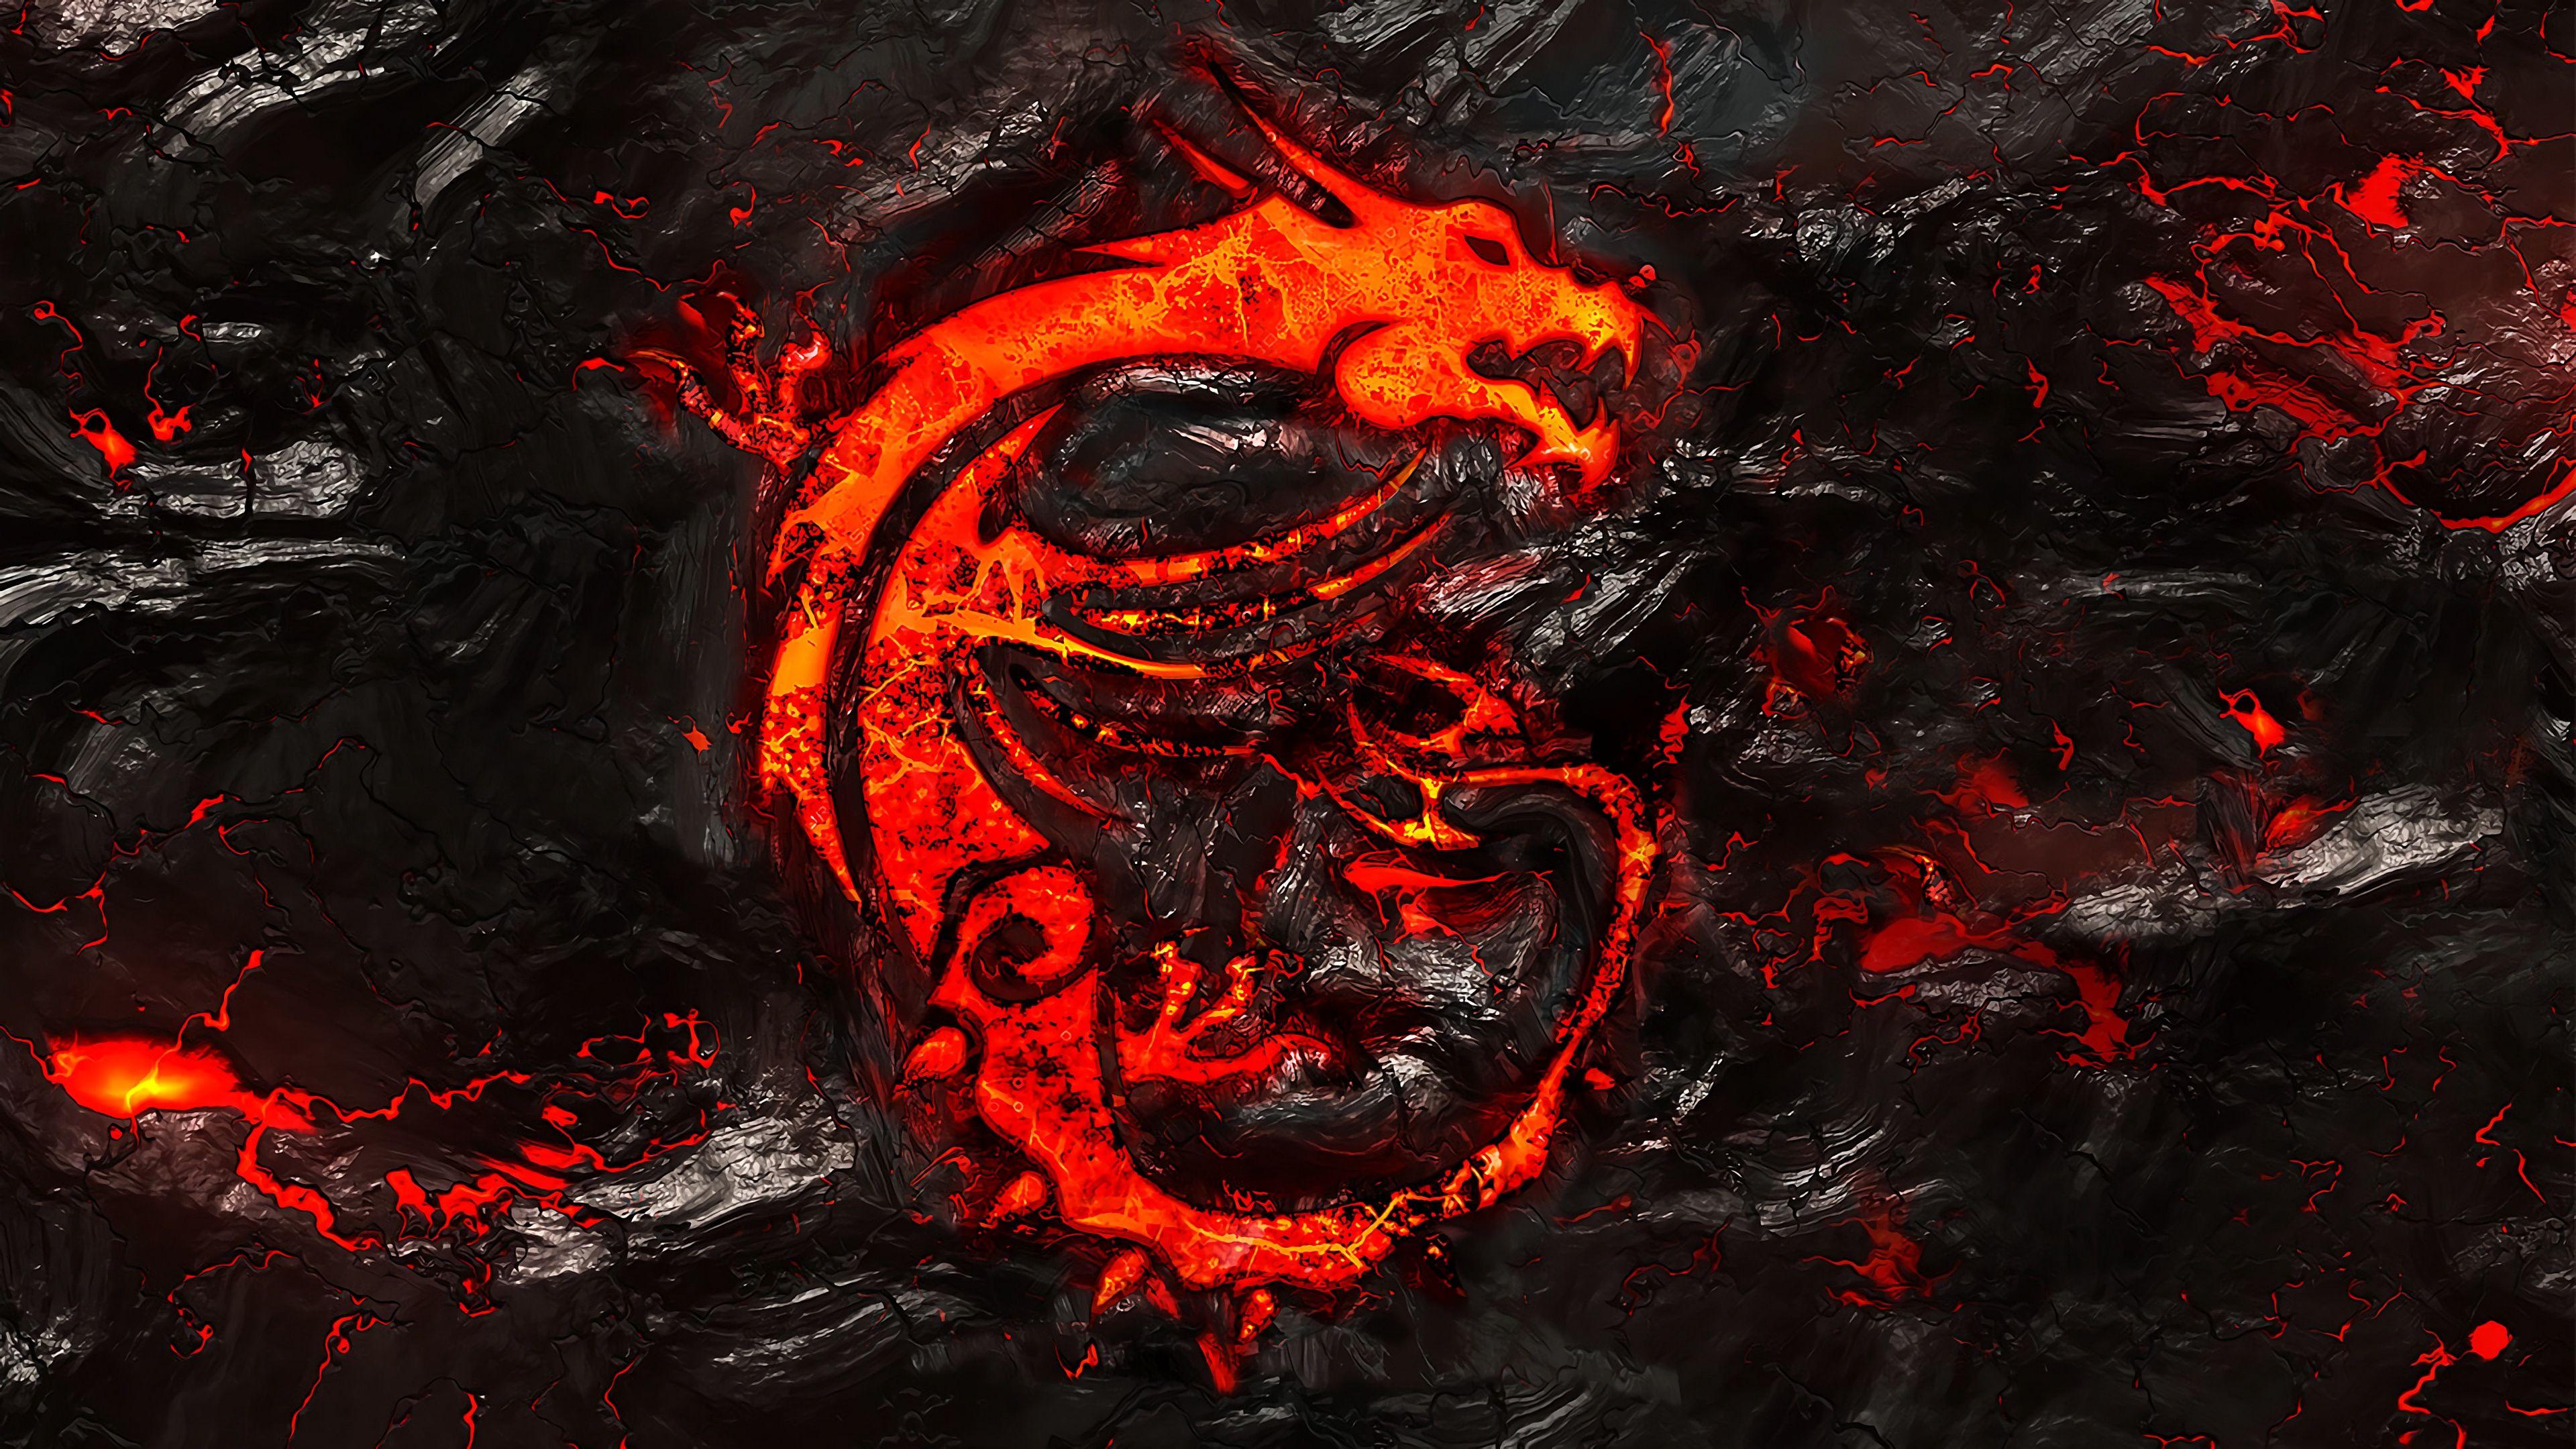 MSI Red Dragon Wallpaper